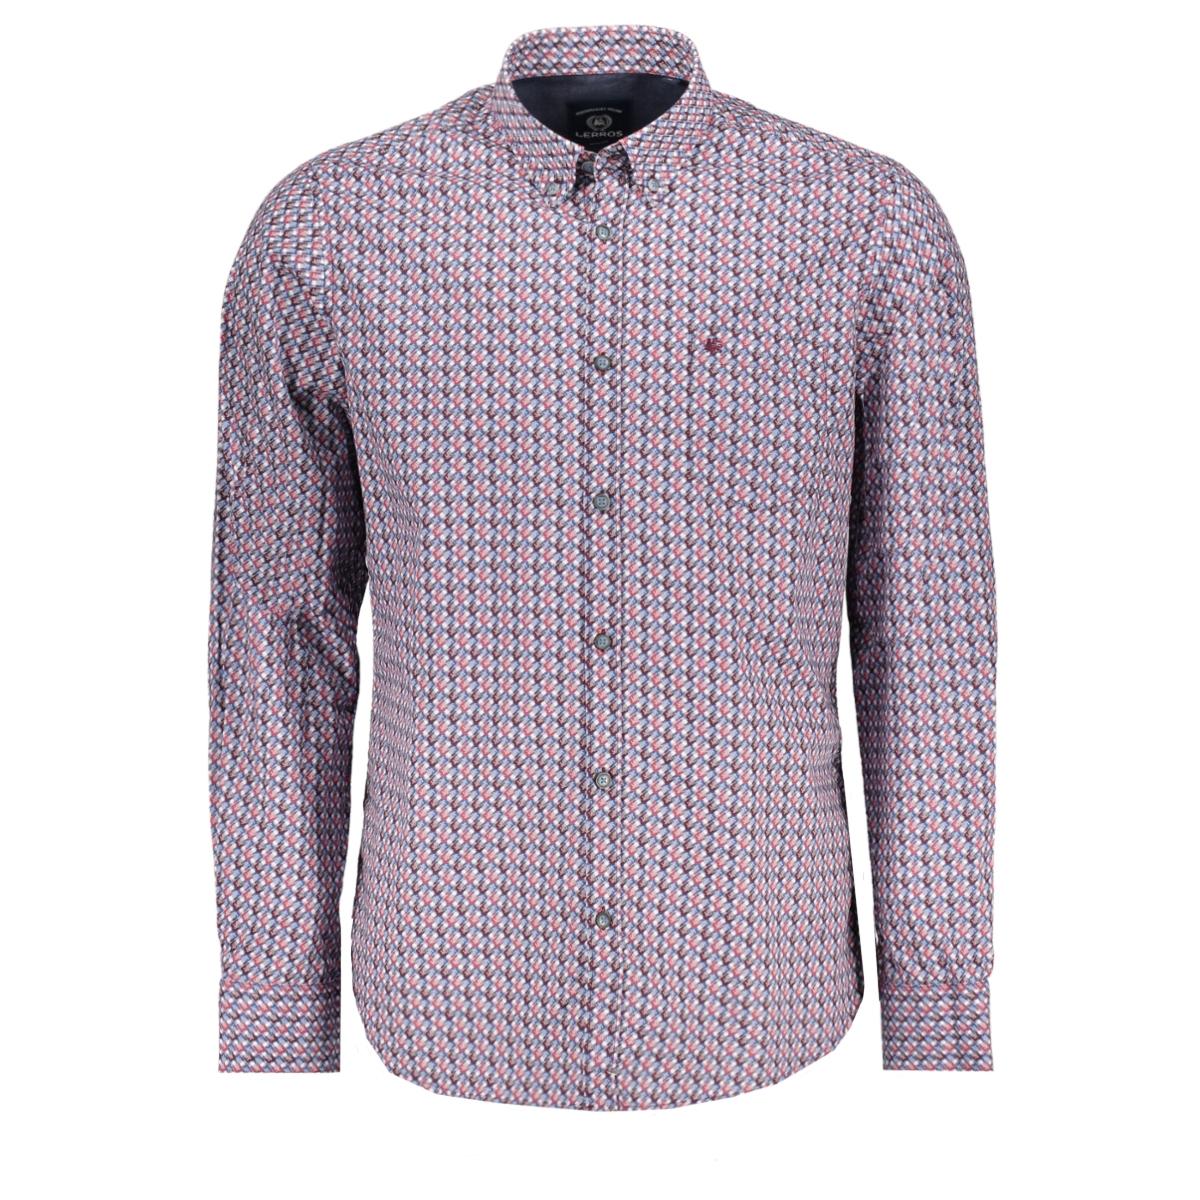 28n1135 lerros overhemd 351